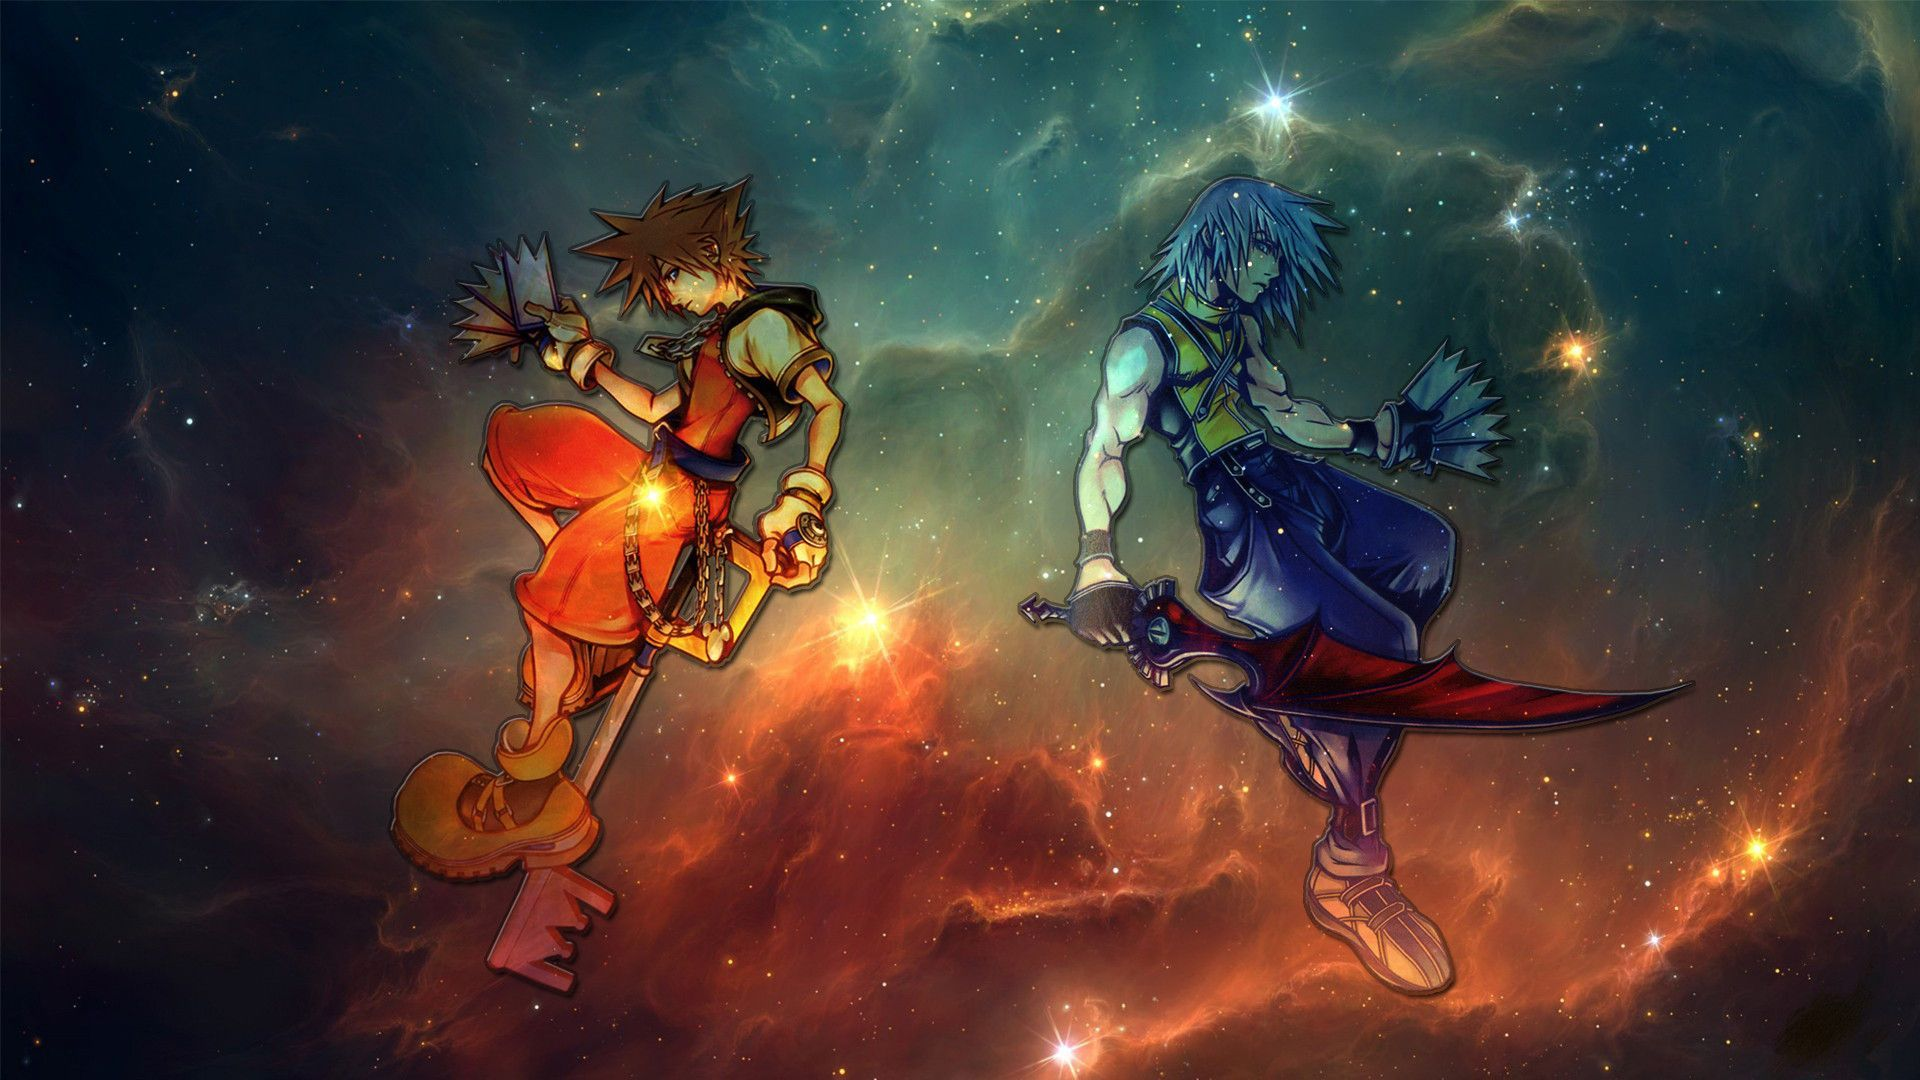 Kingdom Hearts Sora Wallpapers - Top Free Kingdom Hearts ...